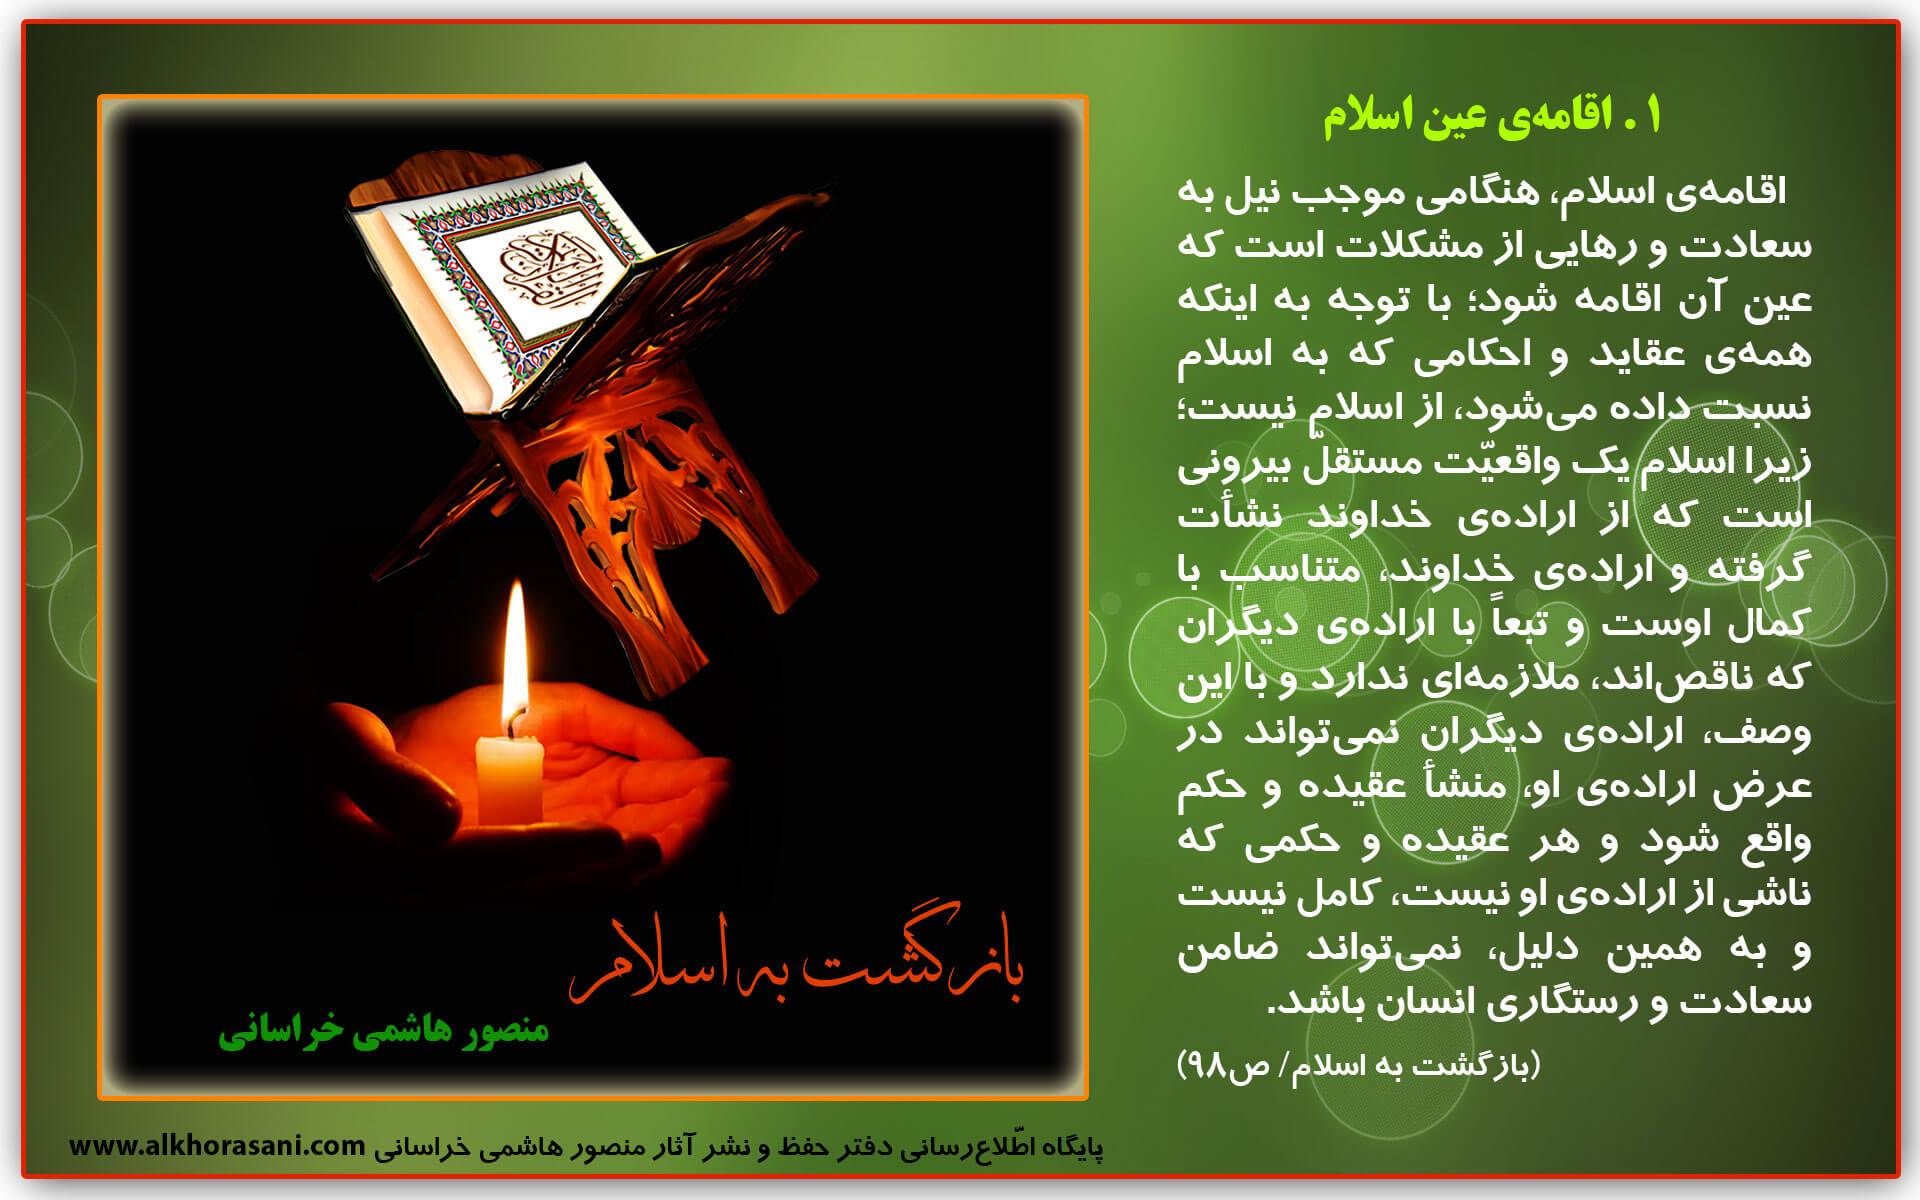 اقامهی عین اسلام